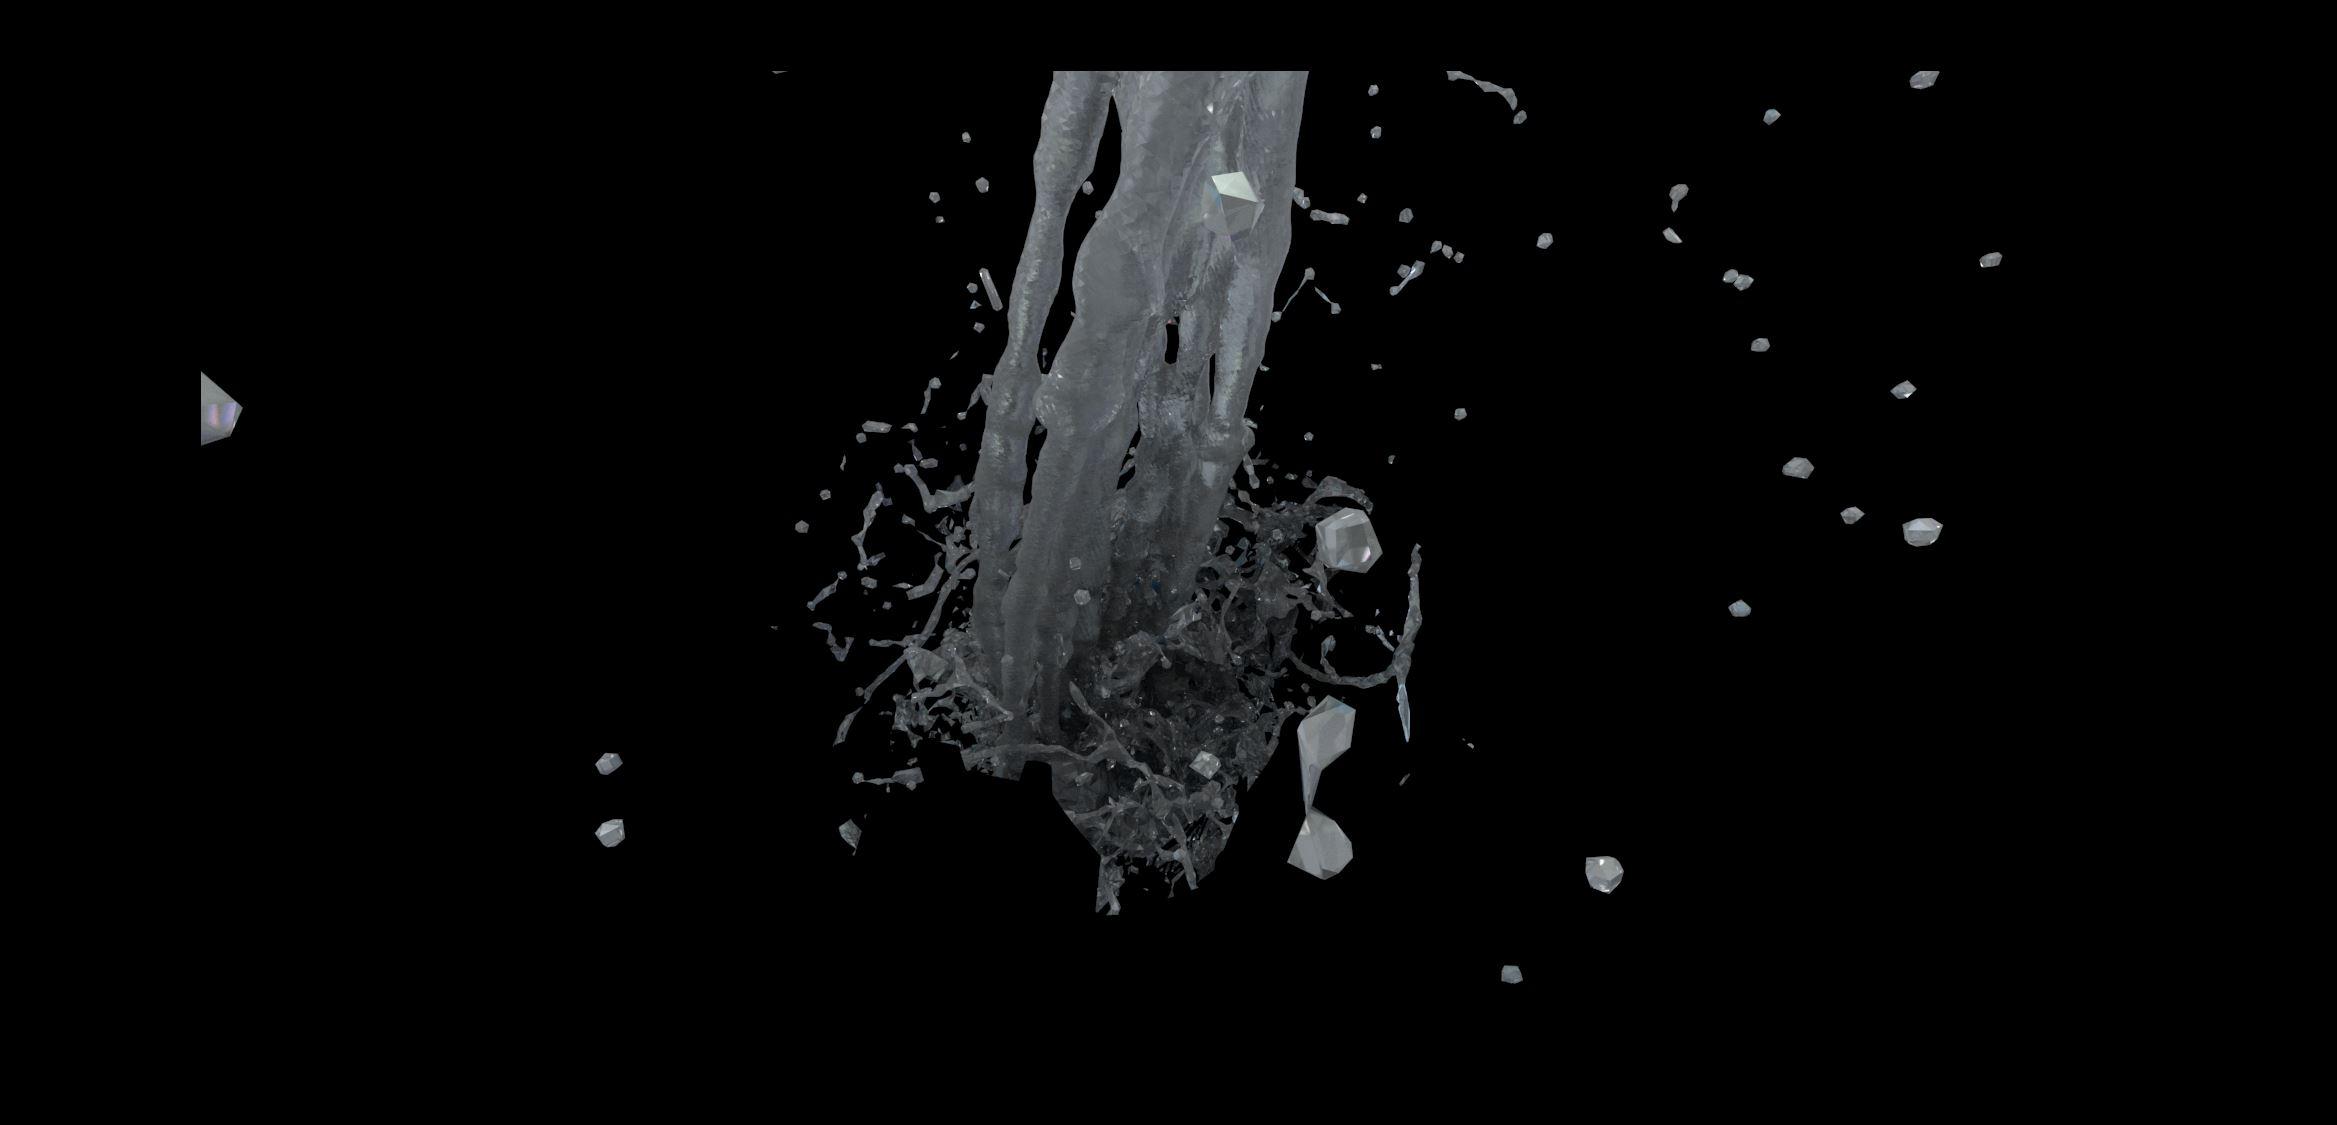 ICE_011.JPG